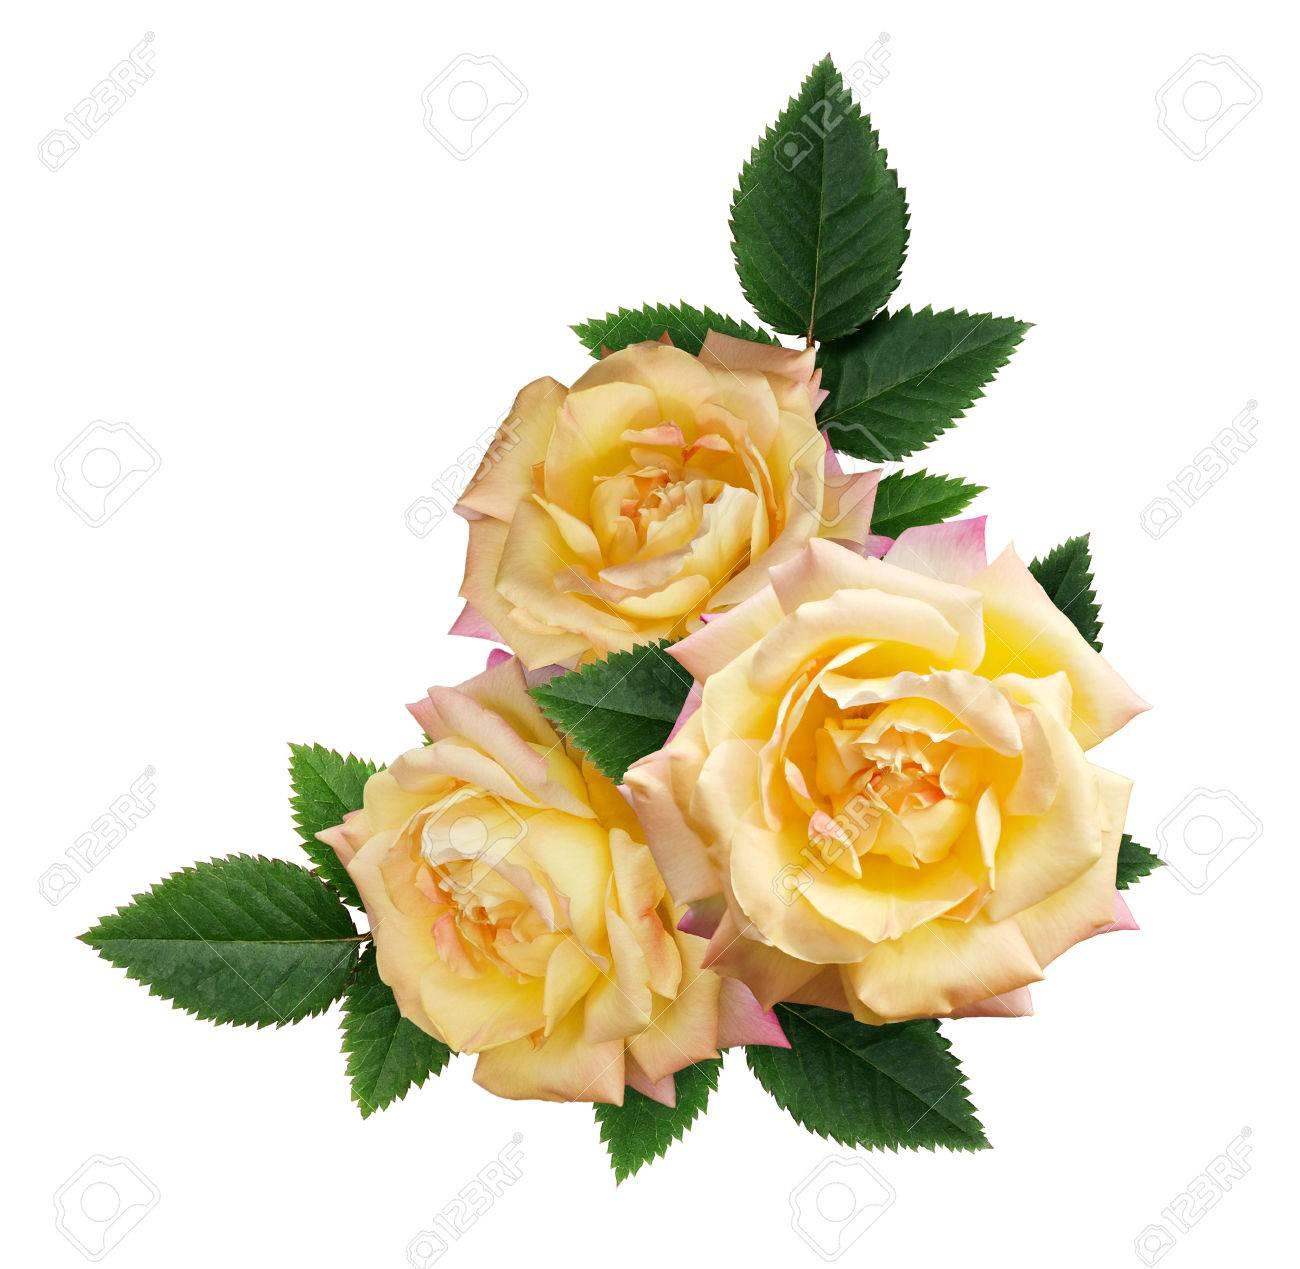 Yellow rose flowers arrangement isolated on white background stock stock photo yellow rose flowers arrangement isolated on white background mightylinksfo